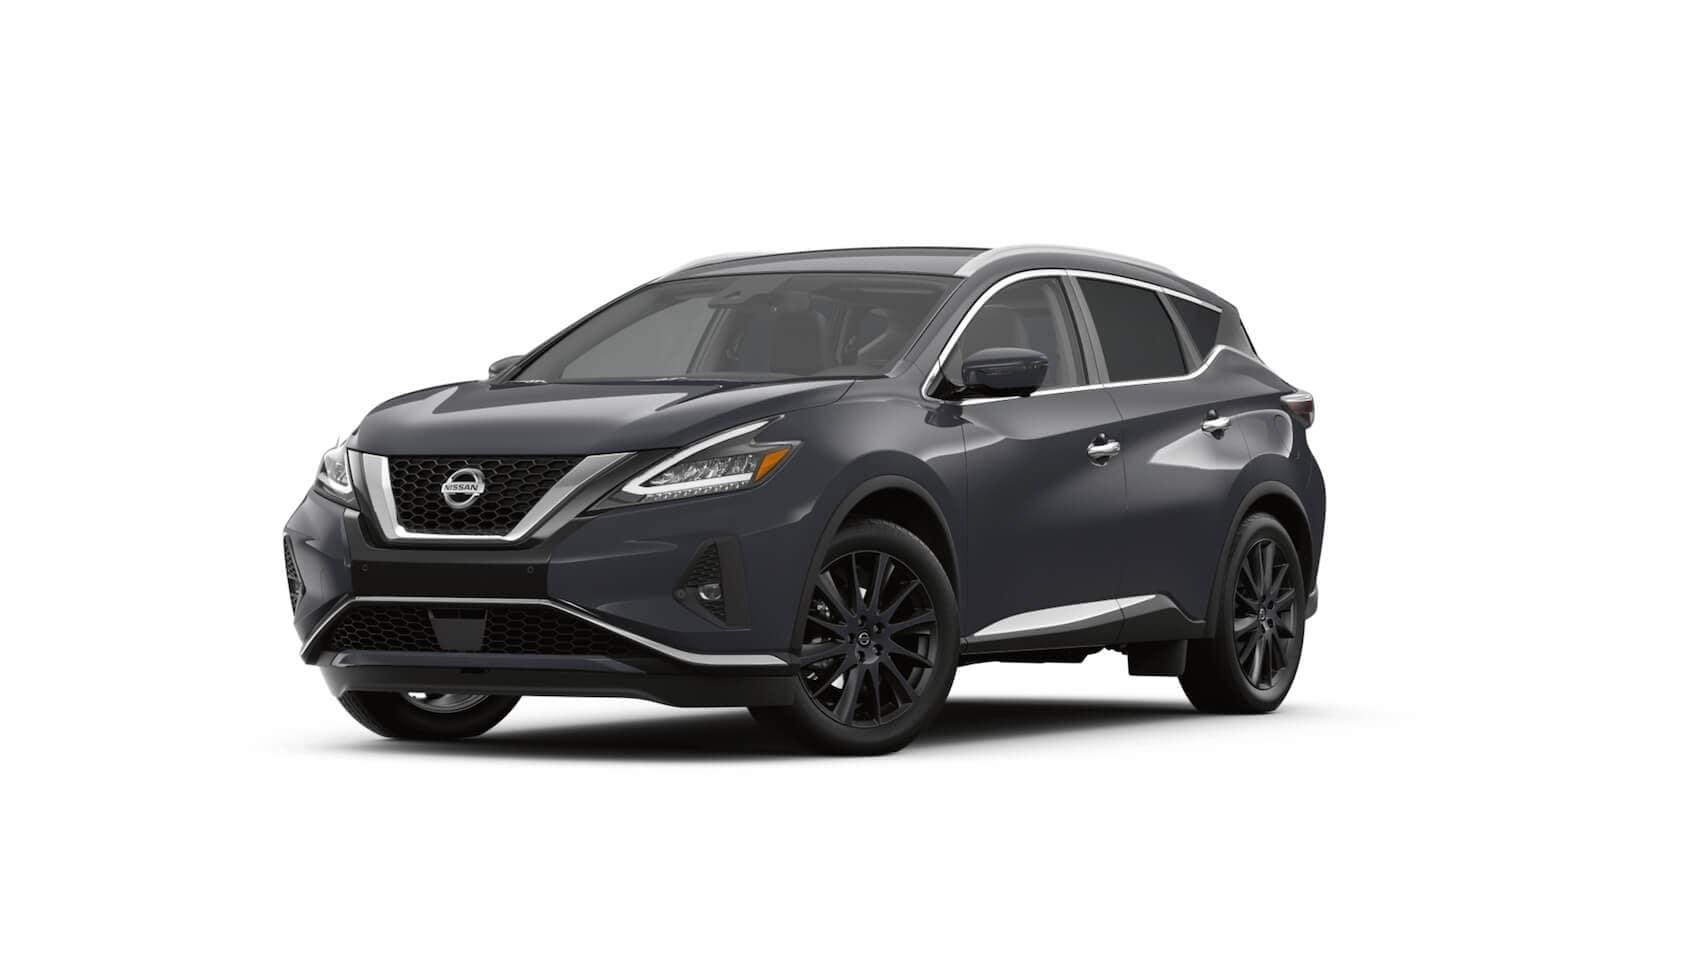 2021 Nissan Murano SL trim level